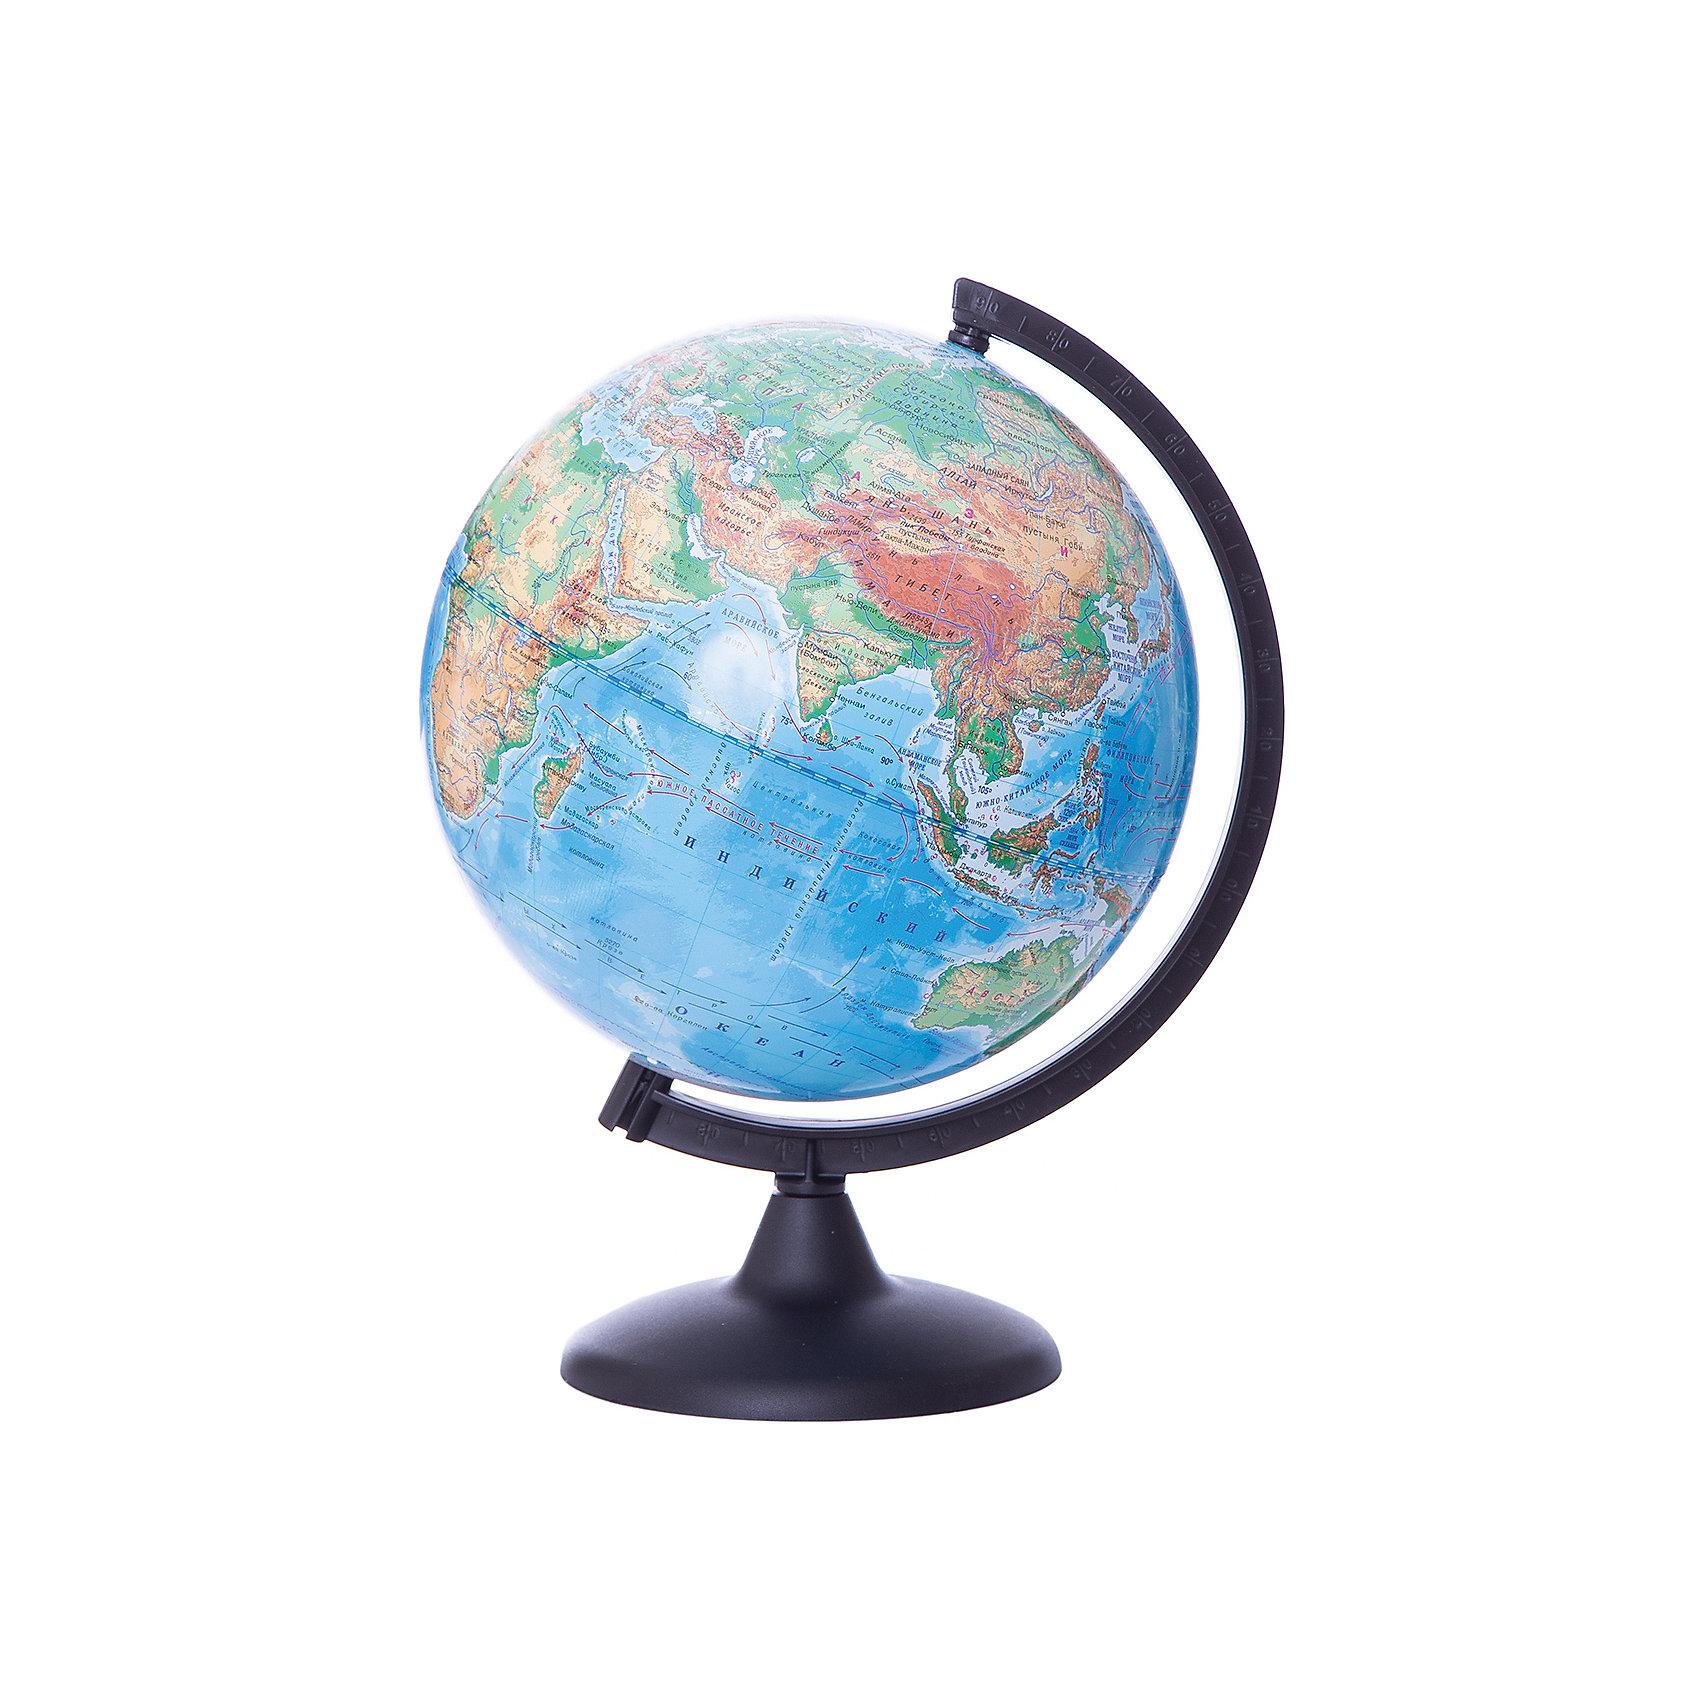 Глобус Земли физический, диаметр 250 ммДиаметр: 250 мм<br><br>Масштаб: 1:50000000<br><br>Материал подставки: Пластик<br><br>Цвет подставки: Прозрачный<br><br>Ширина мм: 260<br>Глубина мм: 260<br>Высота мм: 360<br>Вес г: 650<br>Возраст от месяцев: 72<br>Возраст до месяцев: 2147483647<br>Пол: Унисекс<br>Возраст: Детский<br>SKU: 5518208